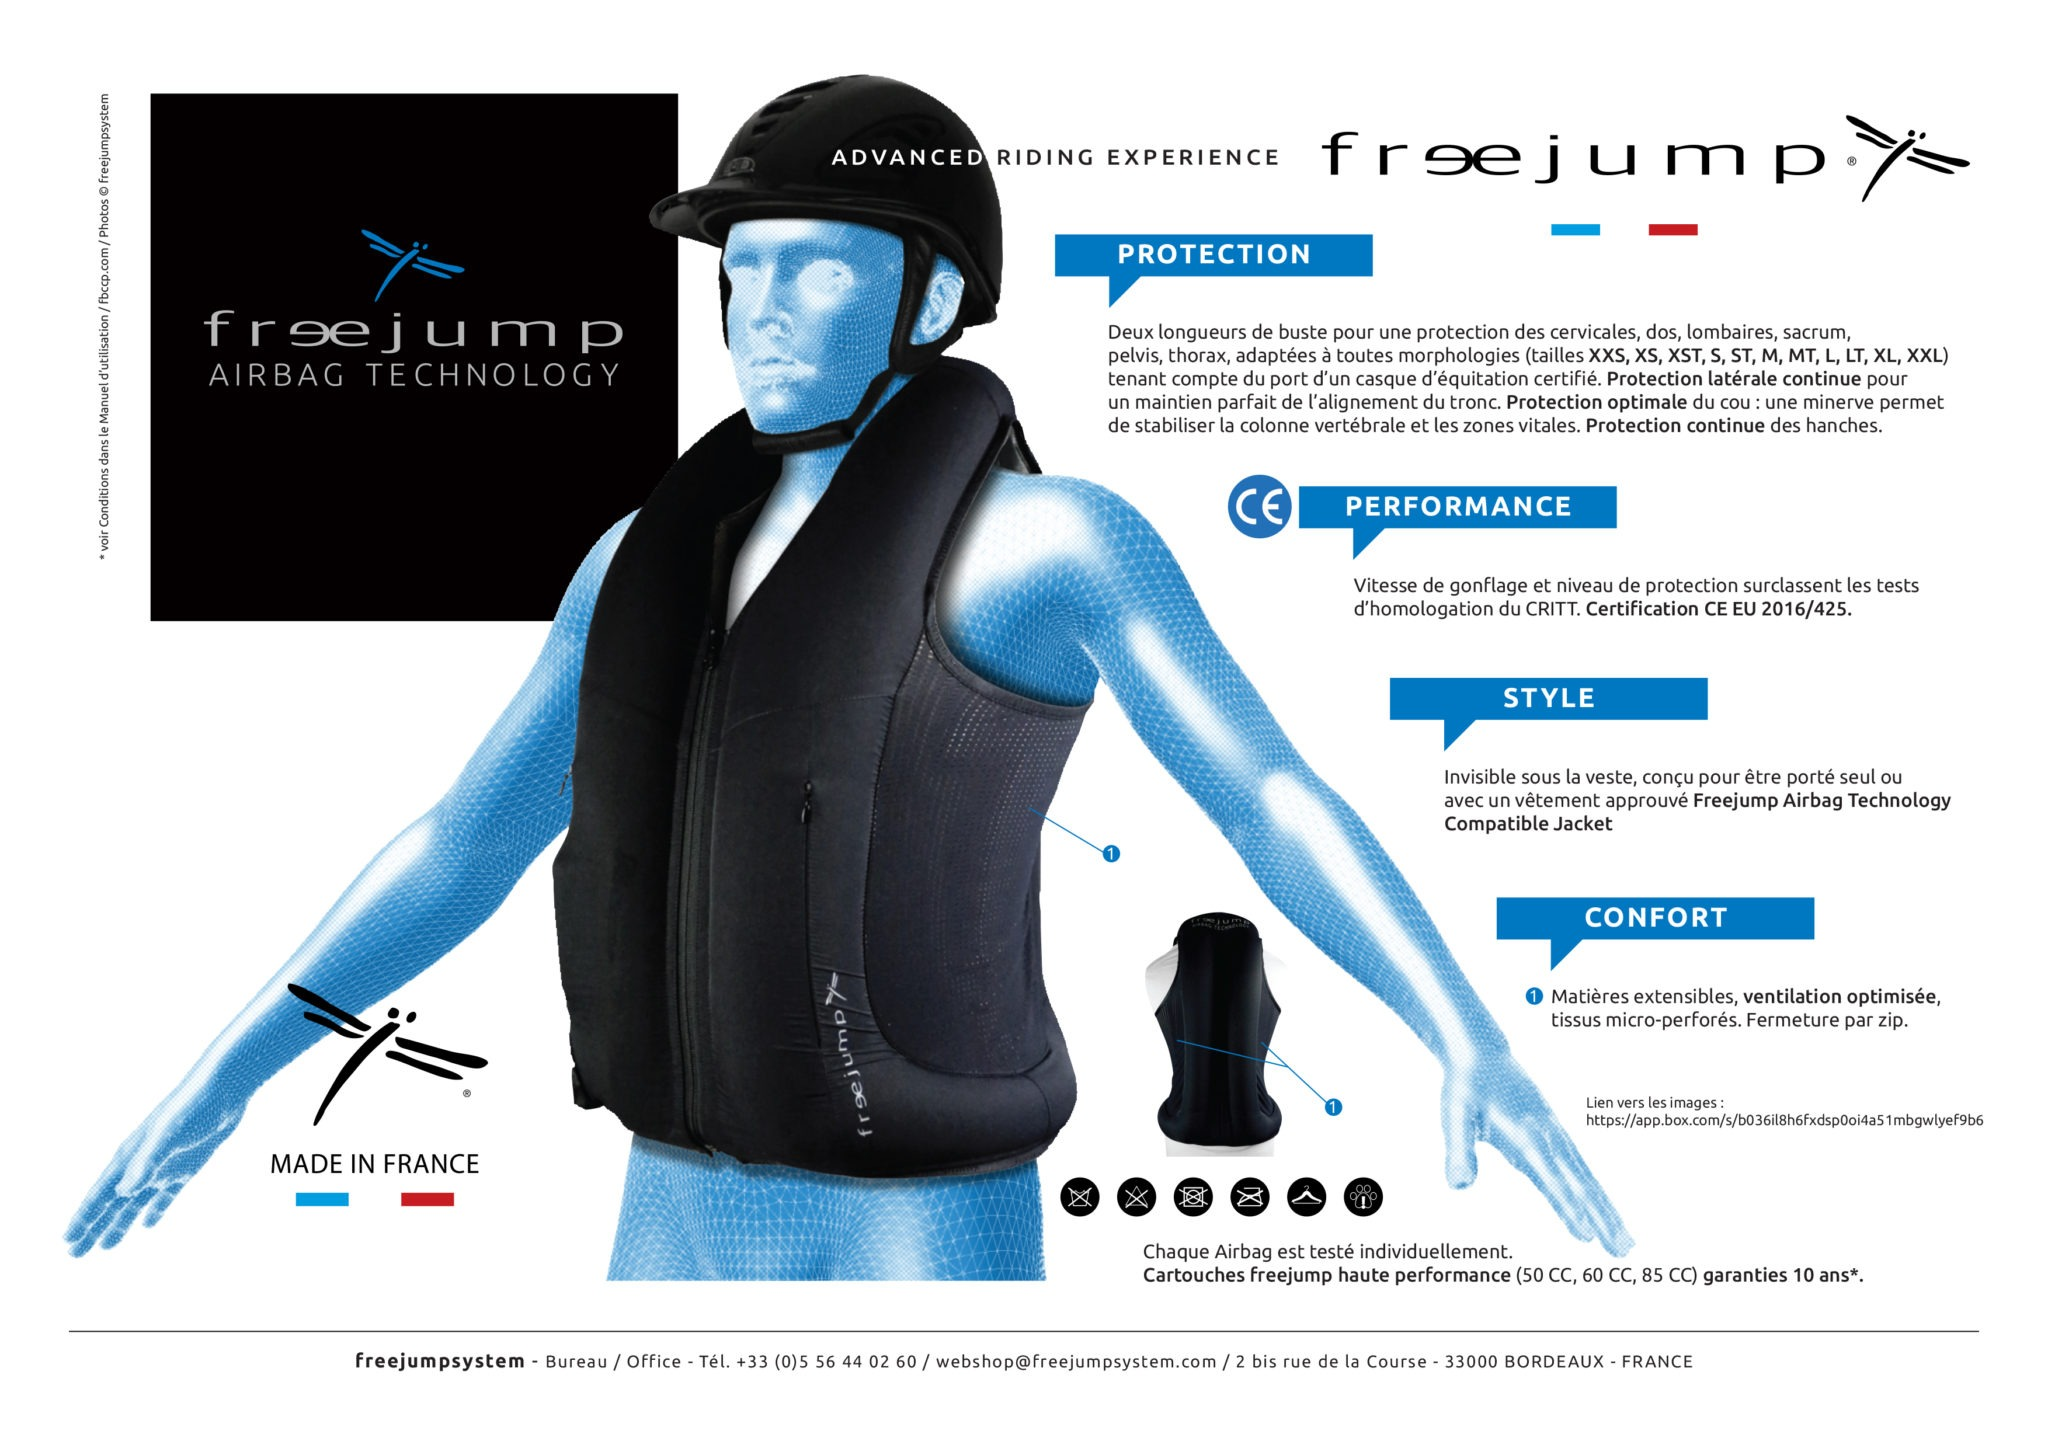 gilet airbag Freejump caractéristiques - Equestra